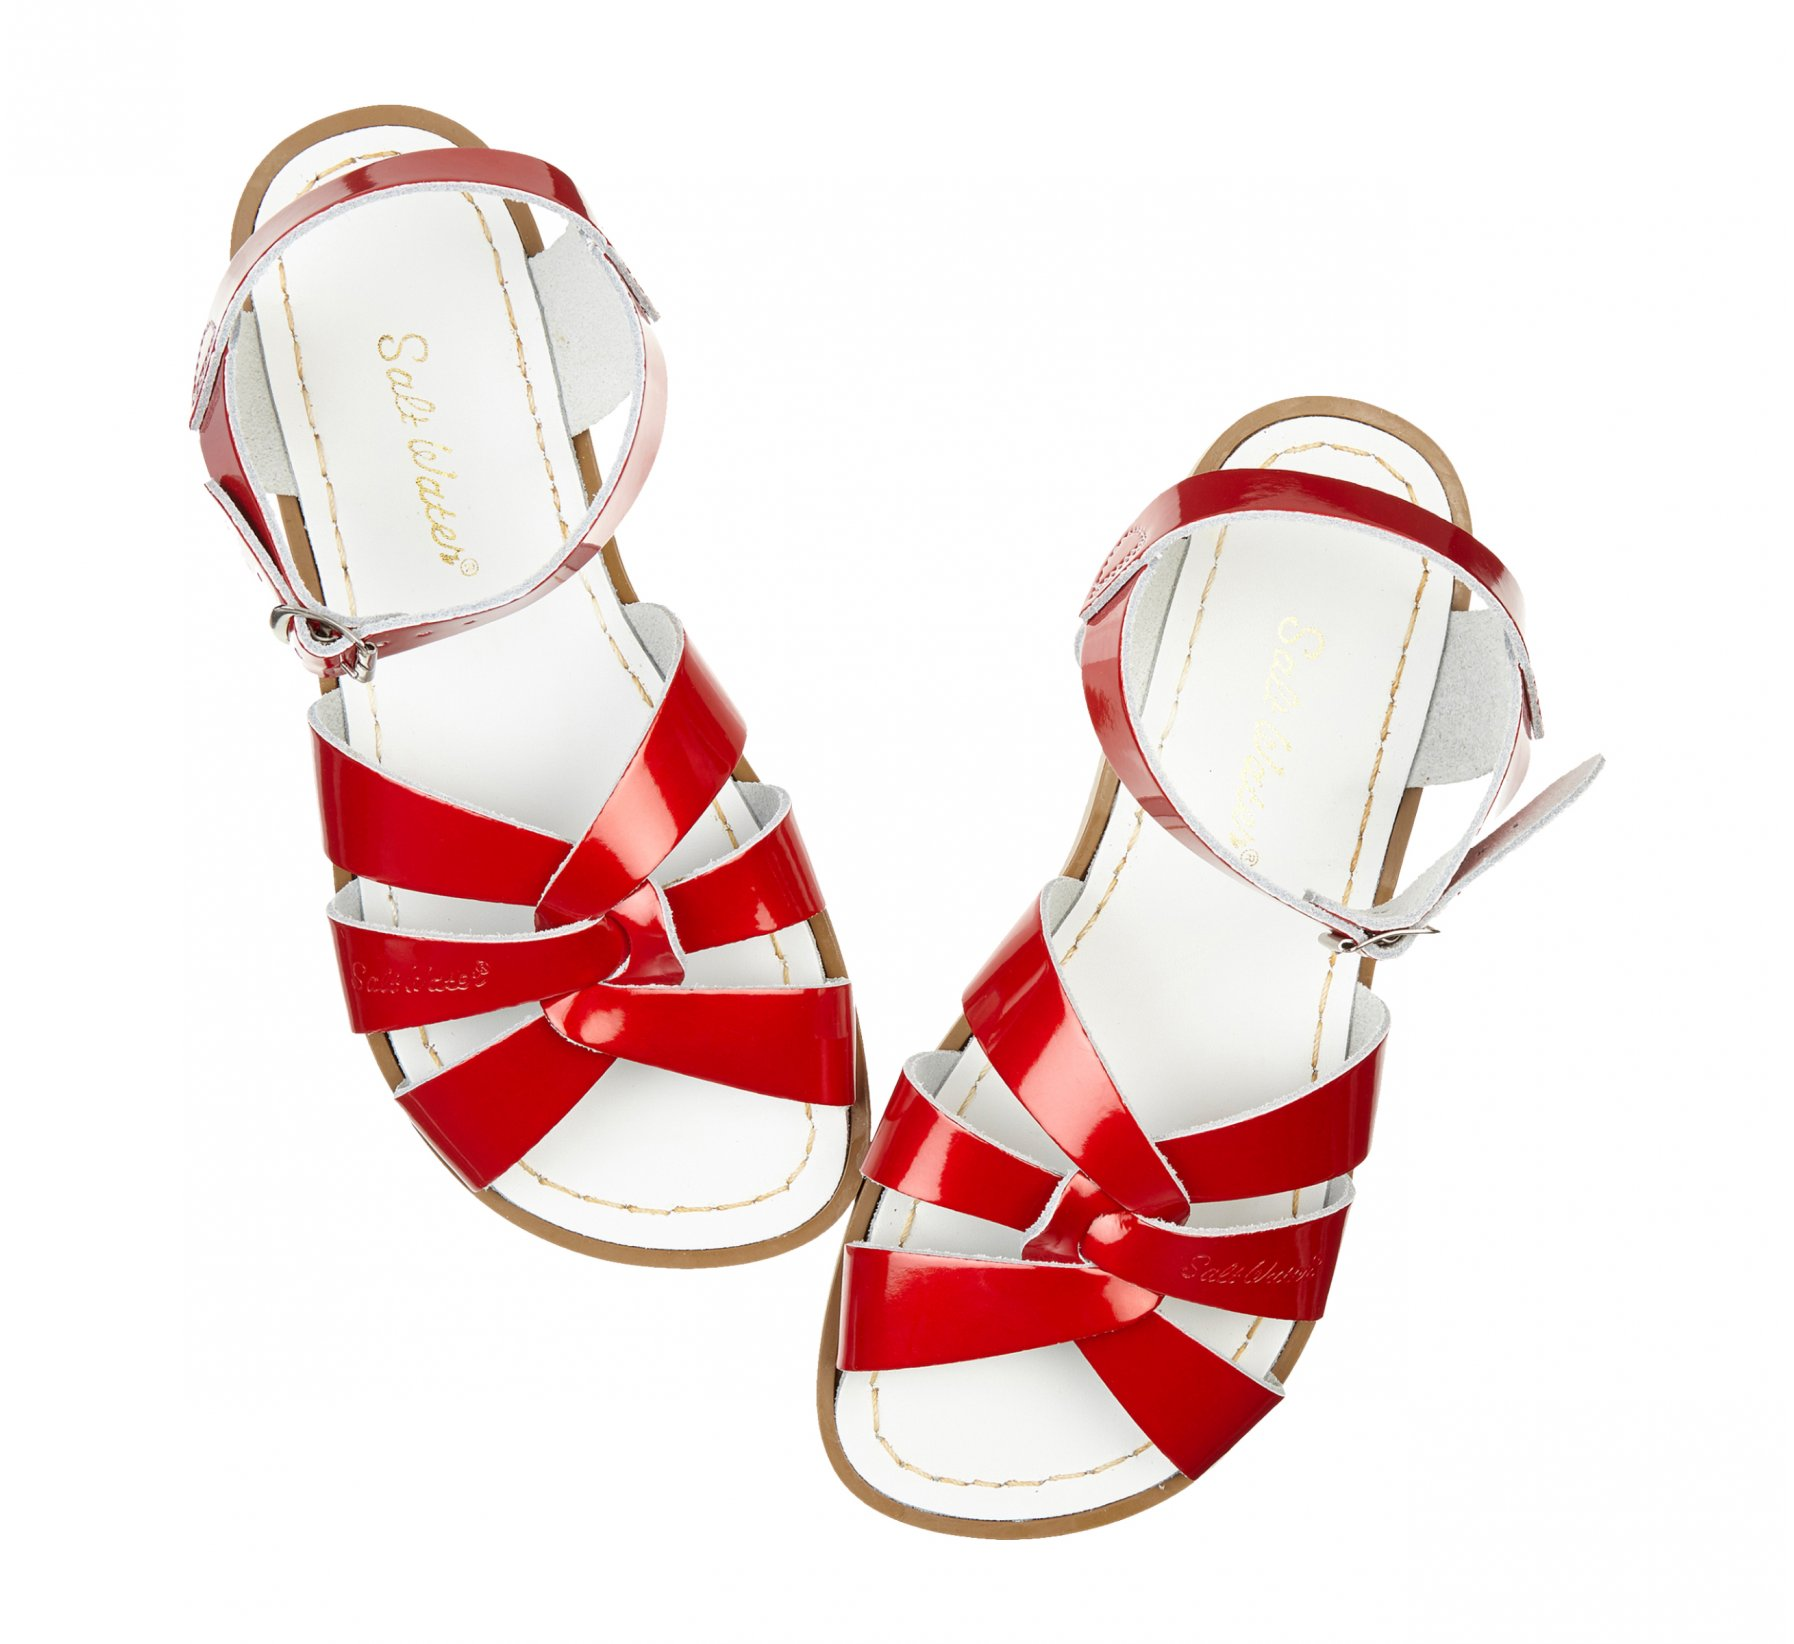 Original Candy Red - Salt Water Sandals